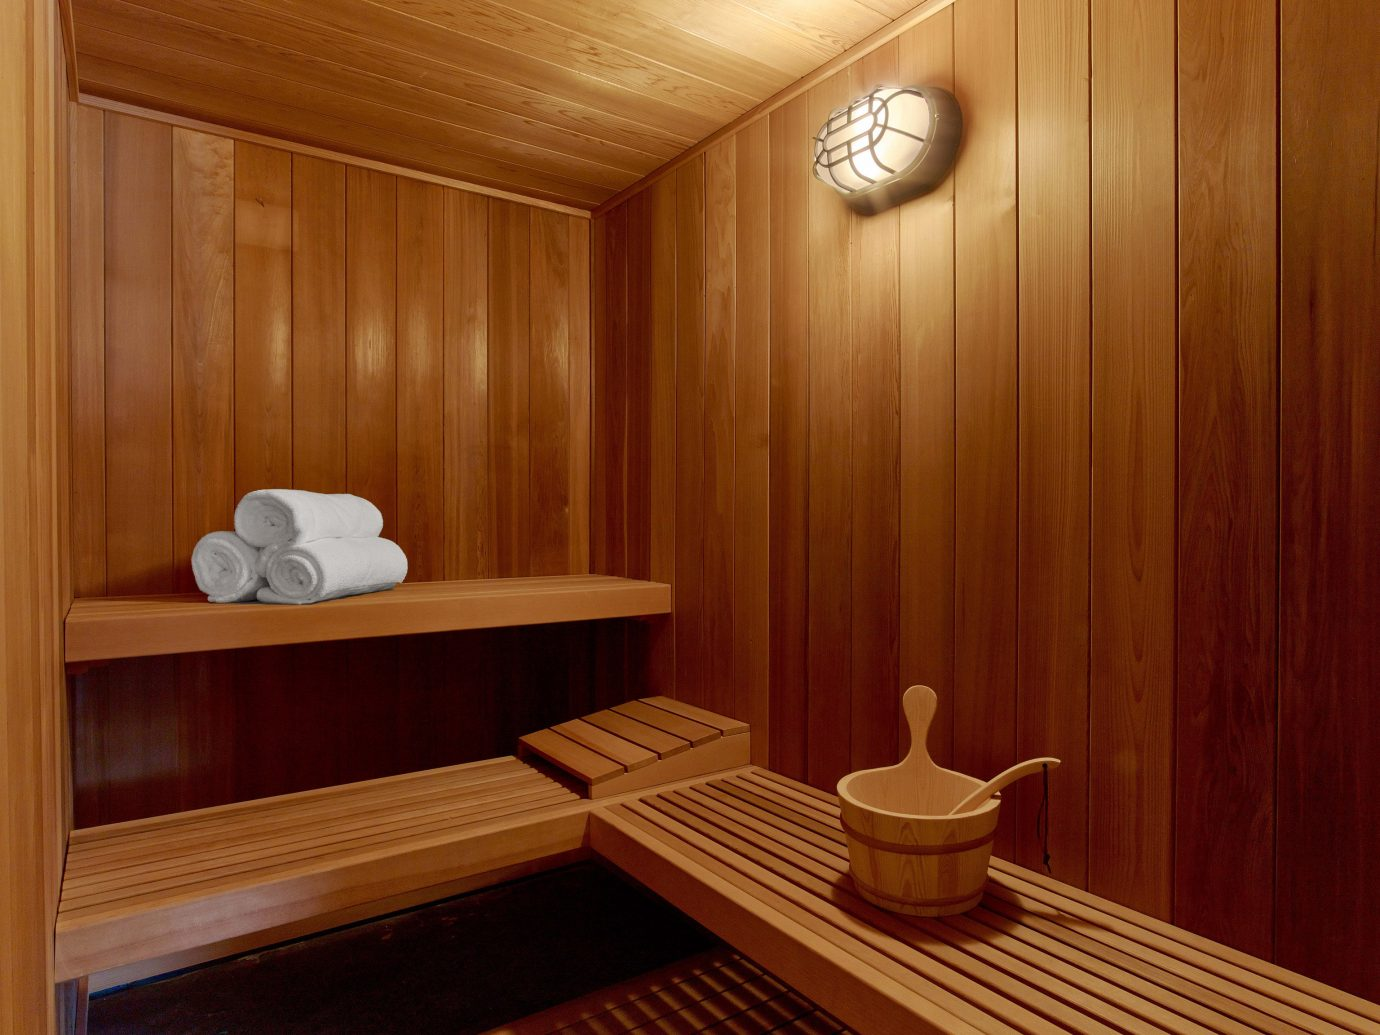 Sauna at The Nobu Villa suite at the Nobu Hotel in Las Vegas